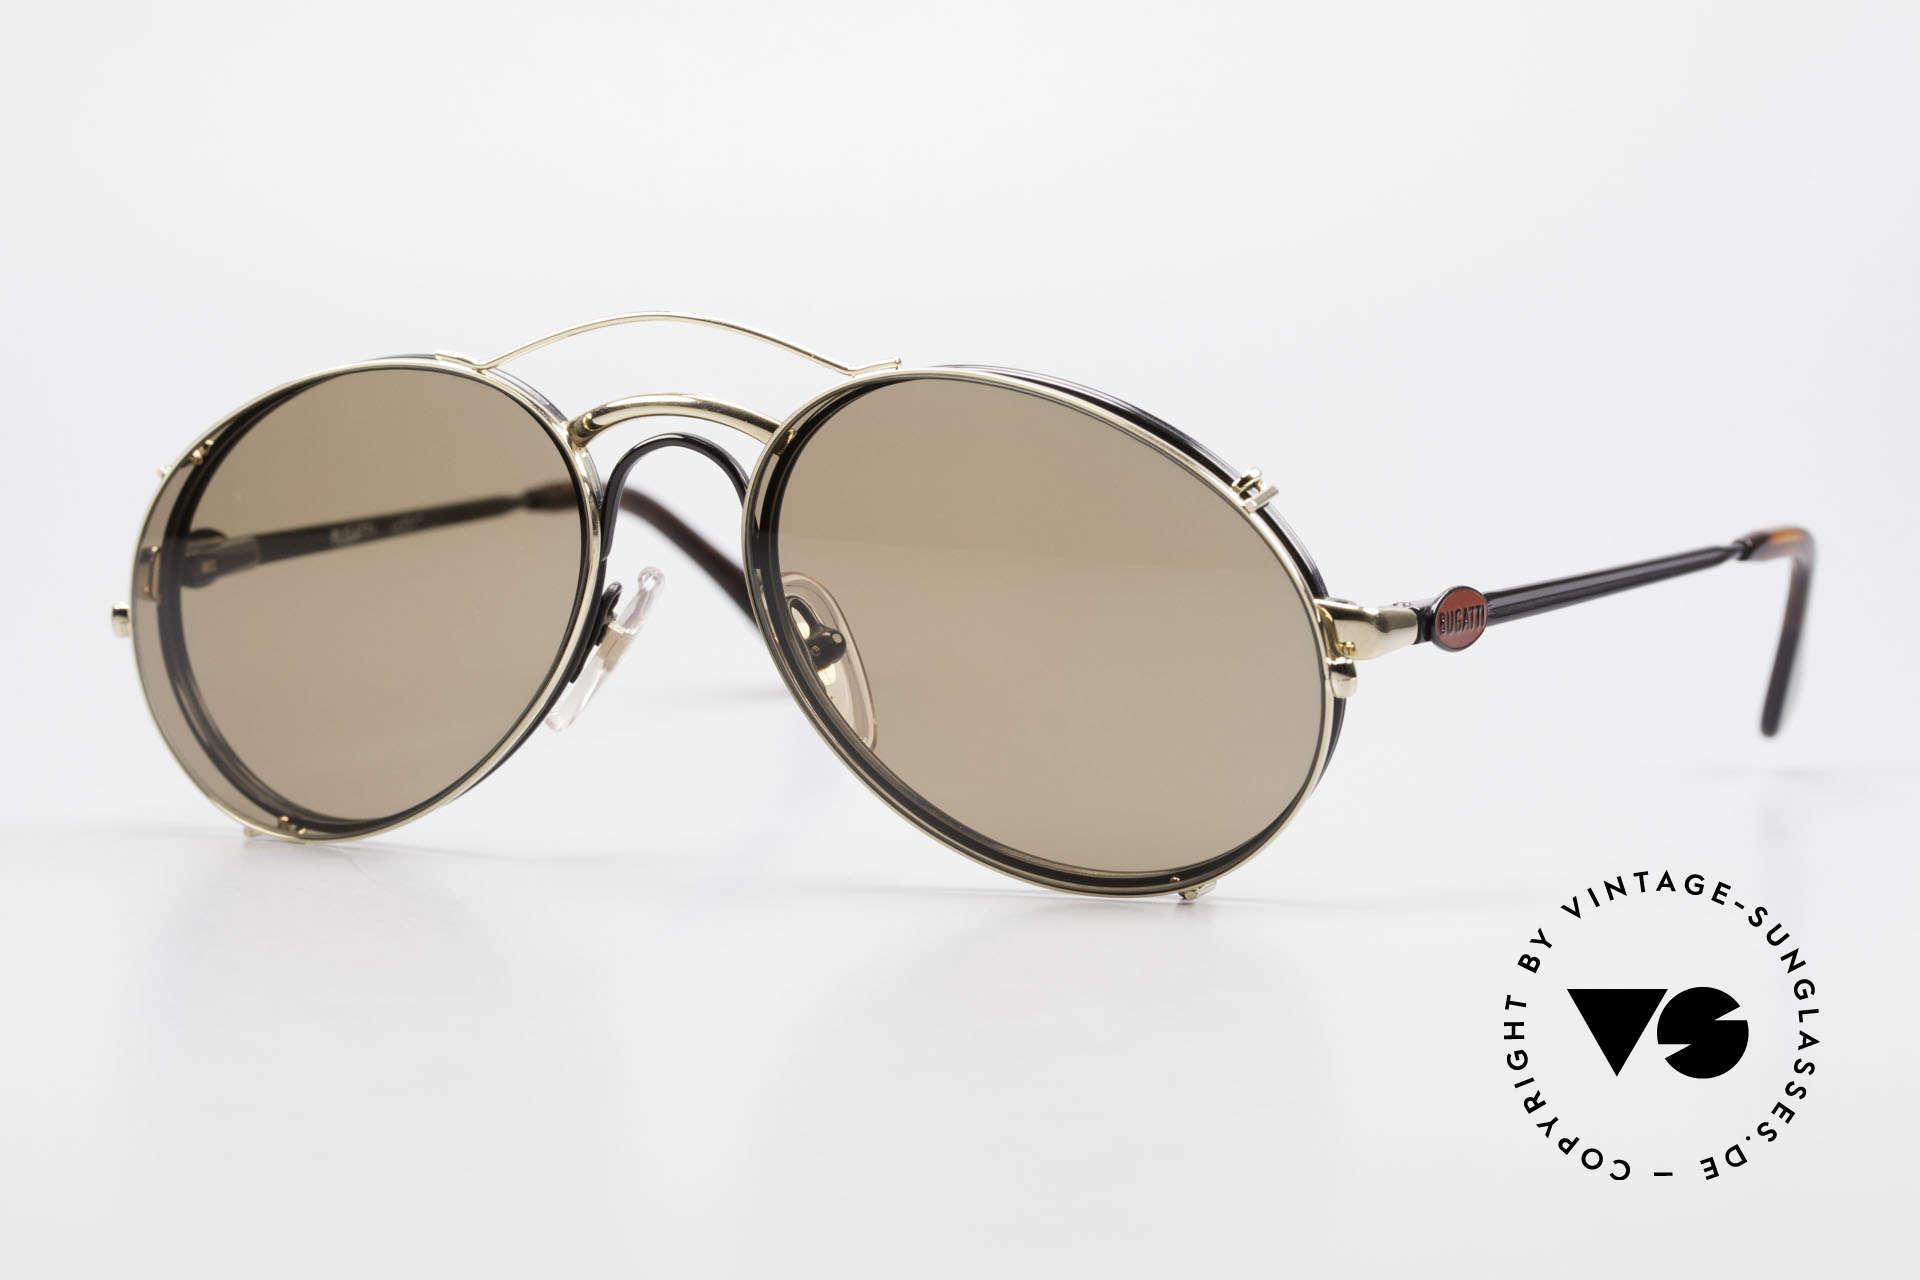 Bugatti 03326 Men's 80's Eyeglasses Clip On, classic vintage Bugatti sunglasses from approx. 1989, Made for Men